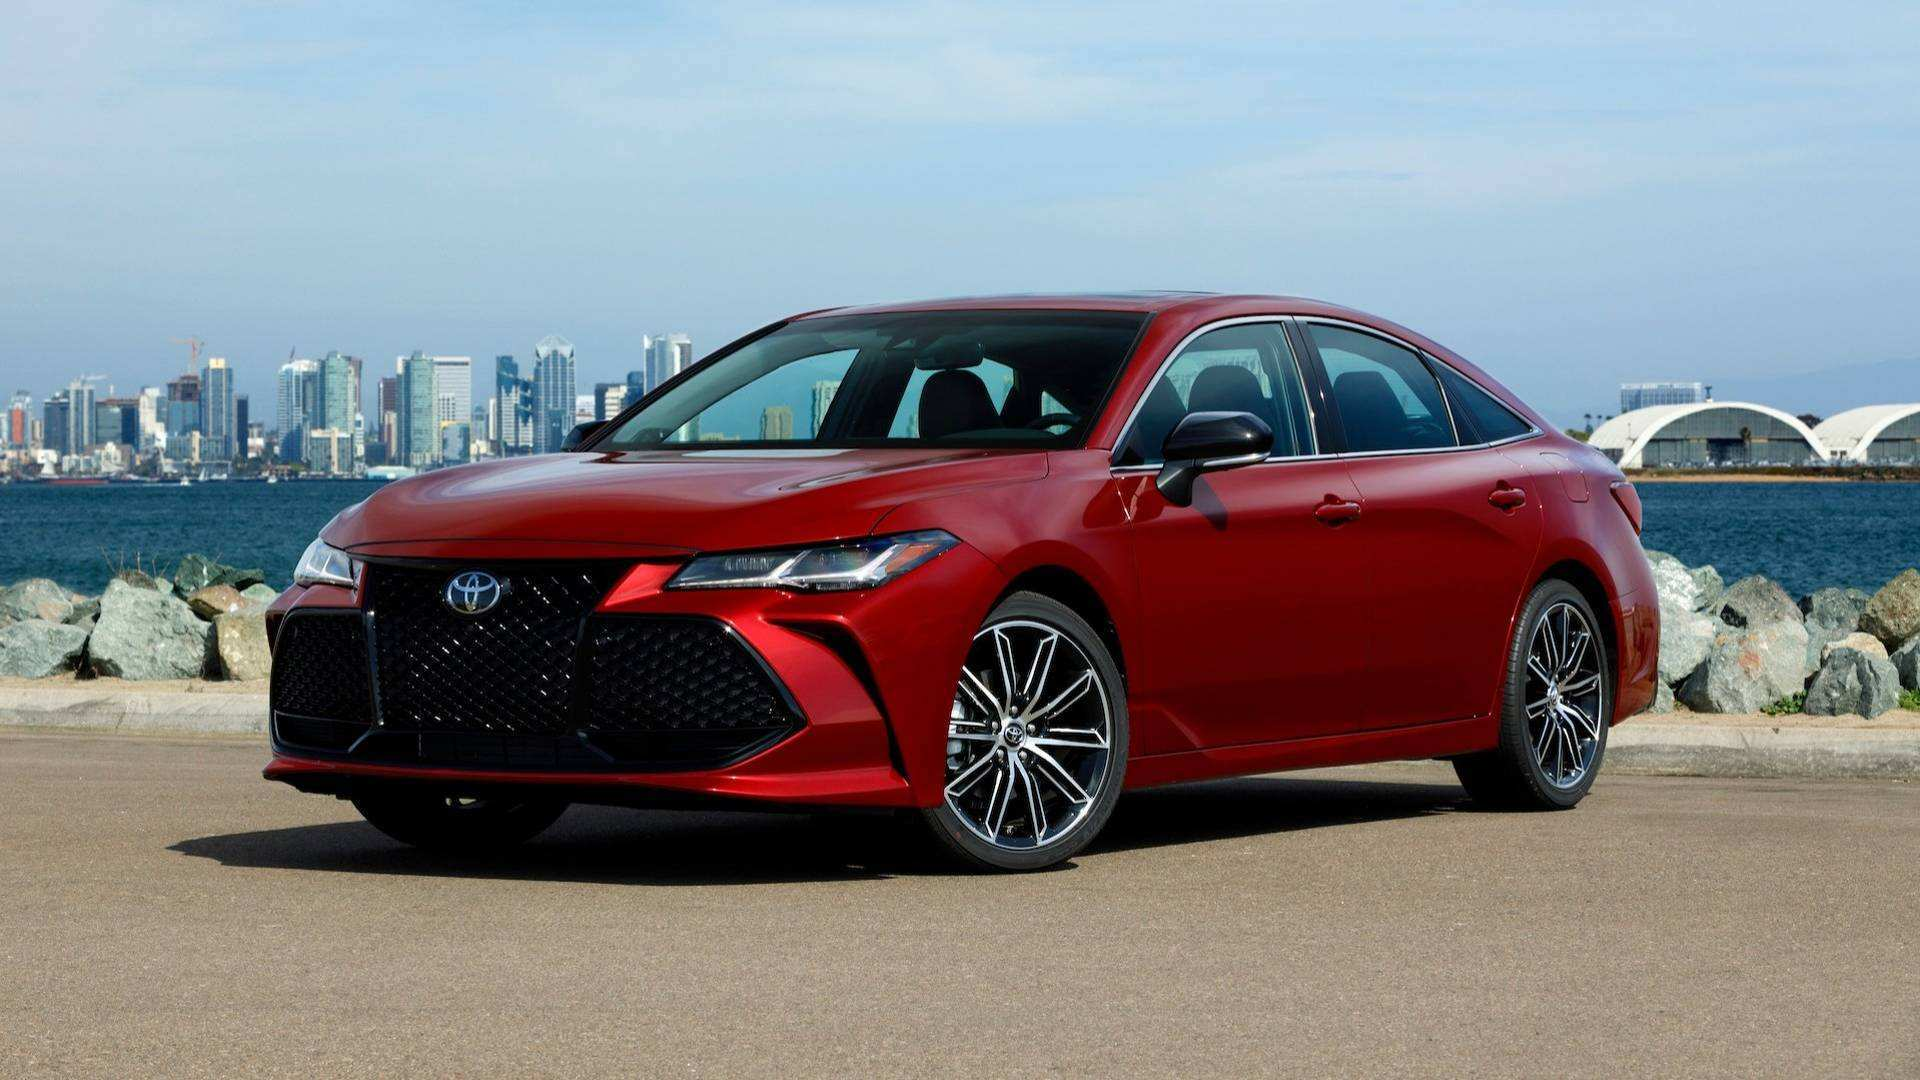 56 Gallery of Best Toyota Avalon Hybrid 2019 Price Specs and Review by Best Toyota Avalon Hybrid 2019 Price